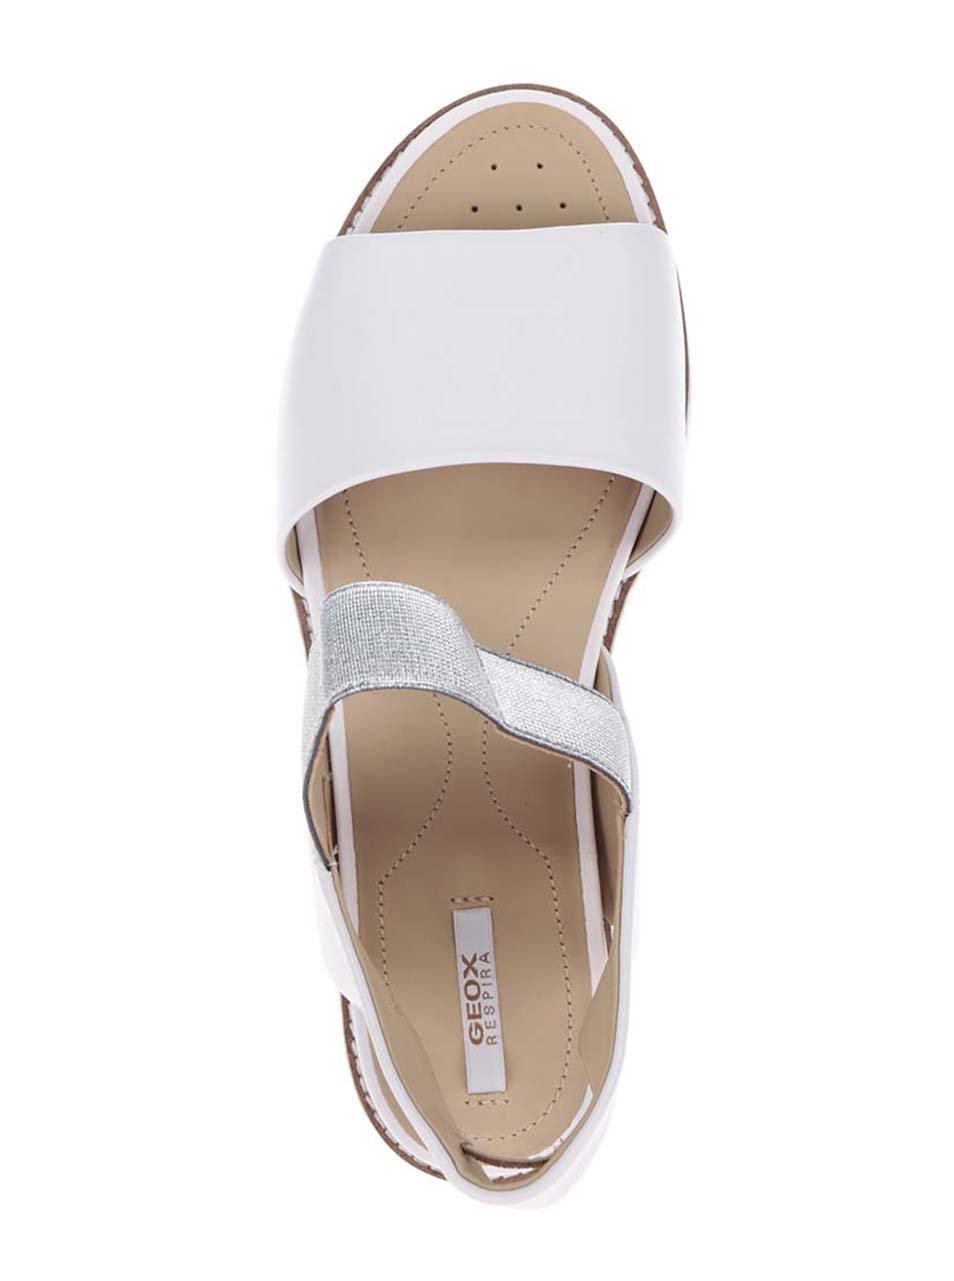 fee854da6445 Biele dámske kožené sandále Geox Darline ...